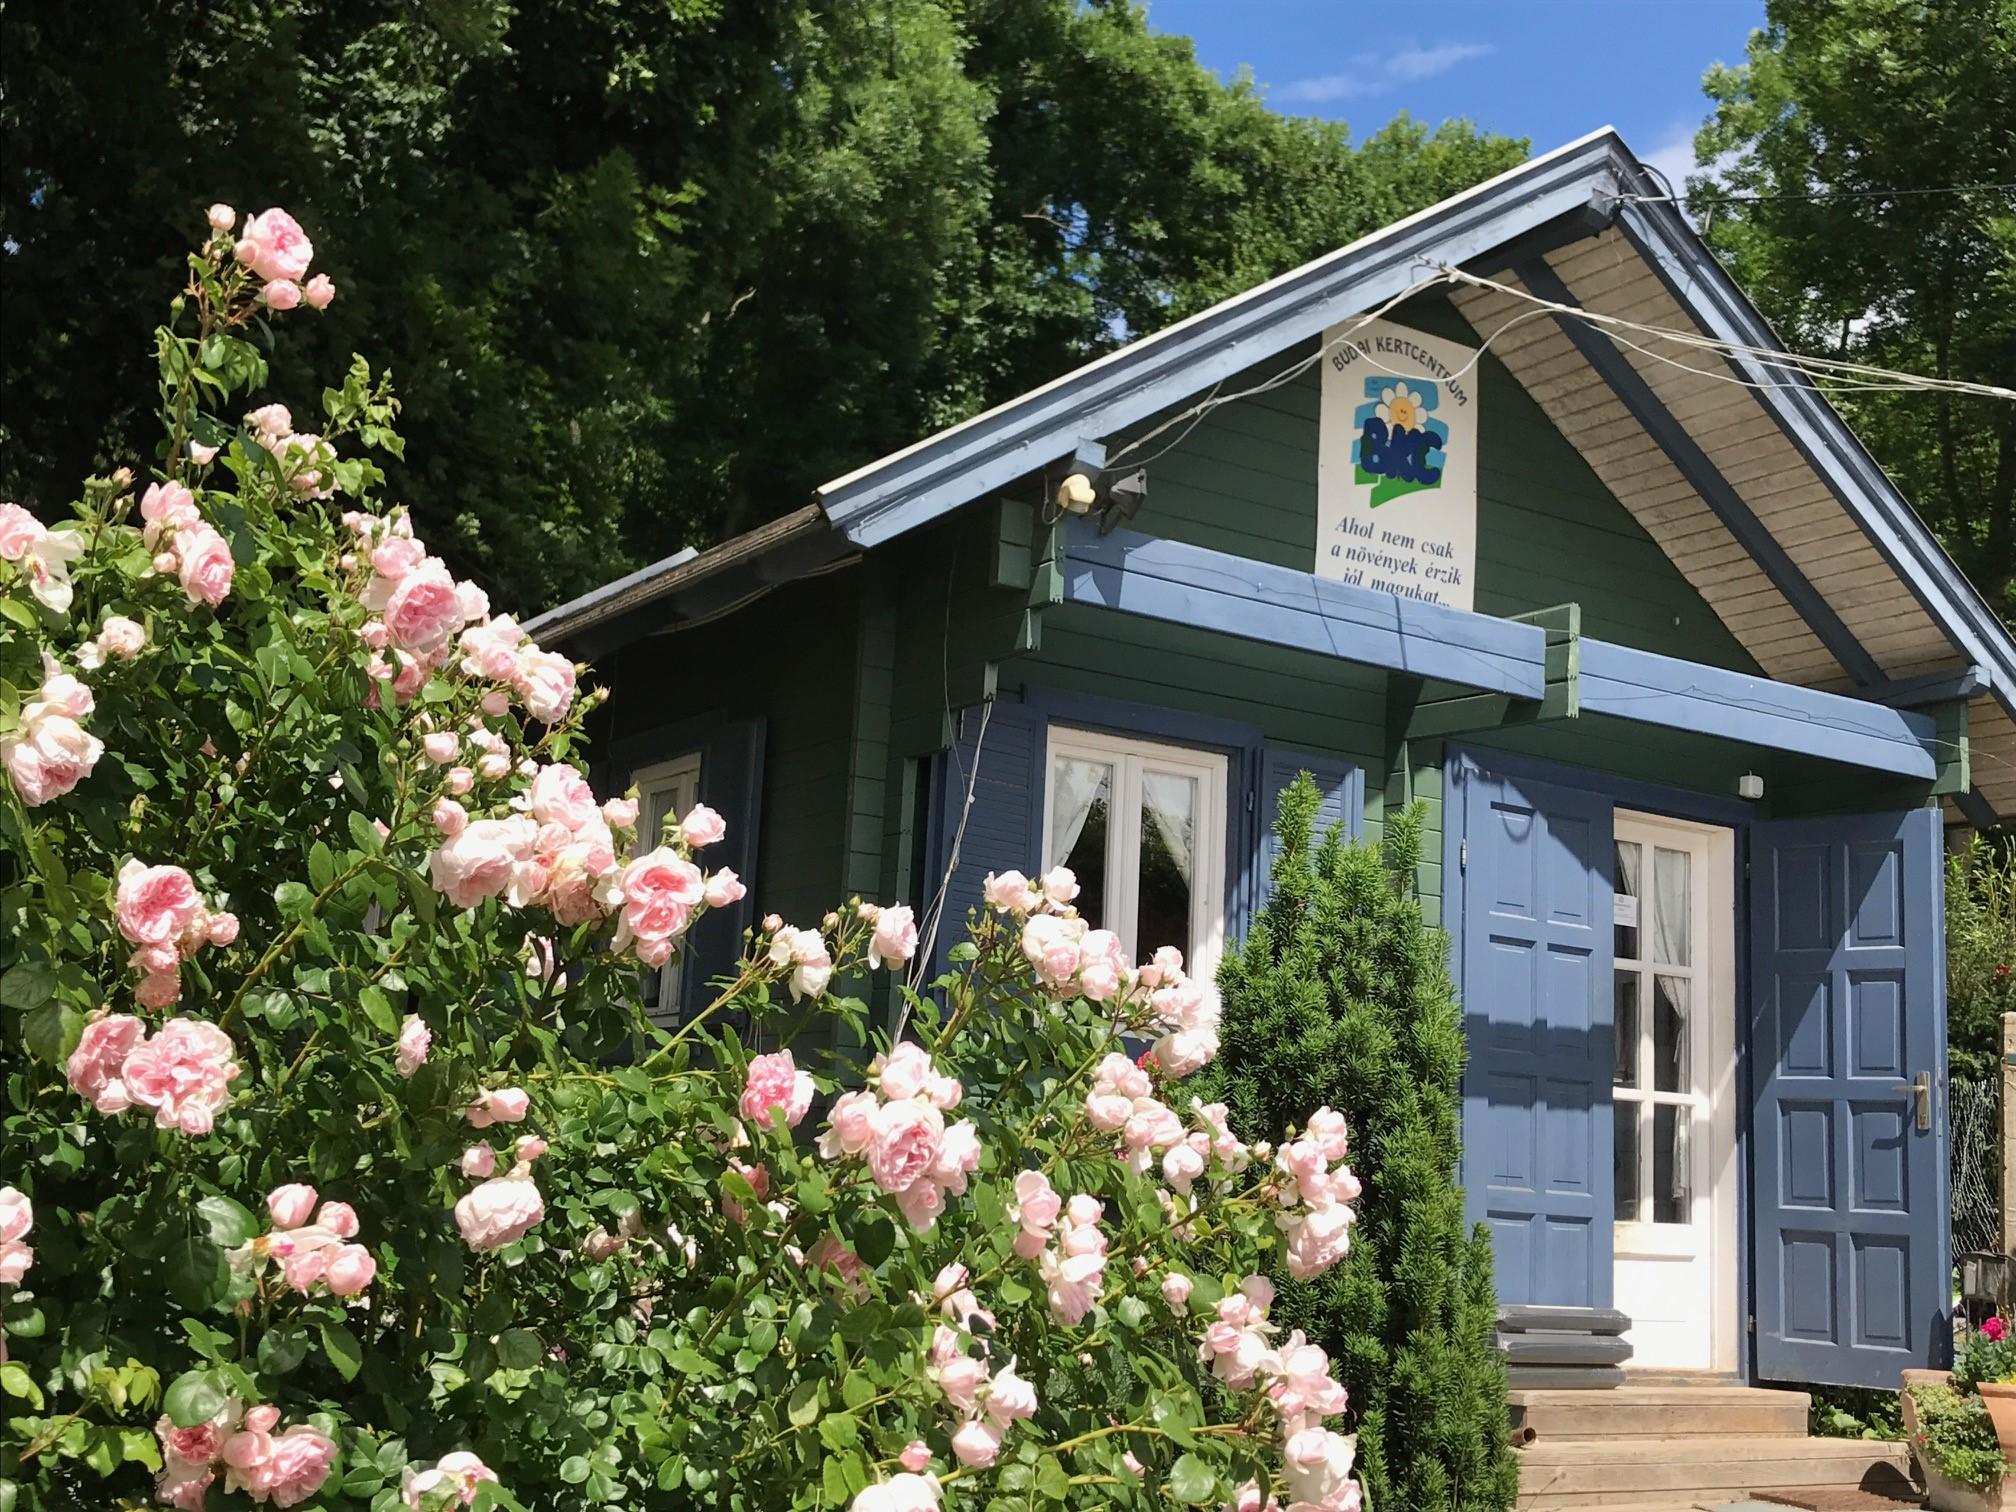 Kertészet - Budai Kertcentrum Kft